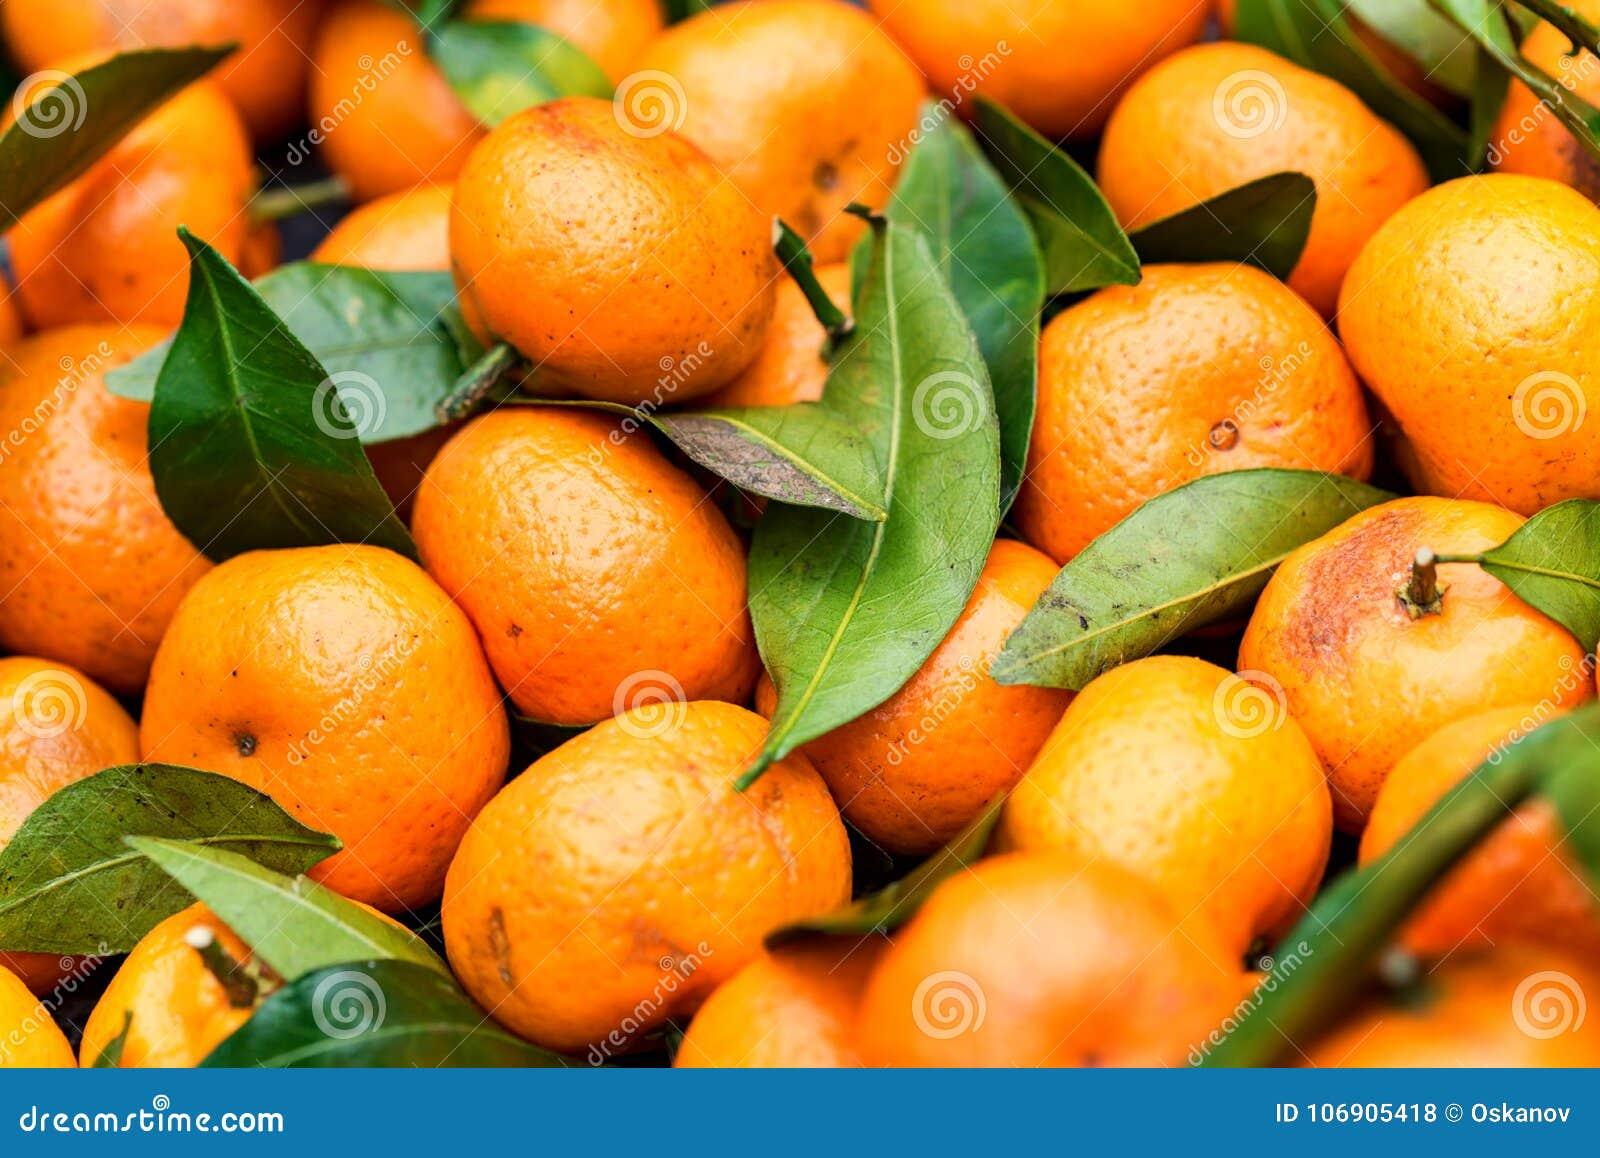 Mandarine tangerine lub pomarańcze tło